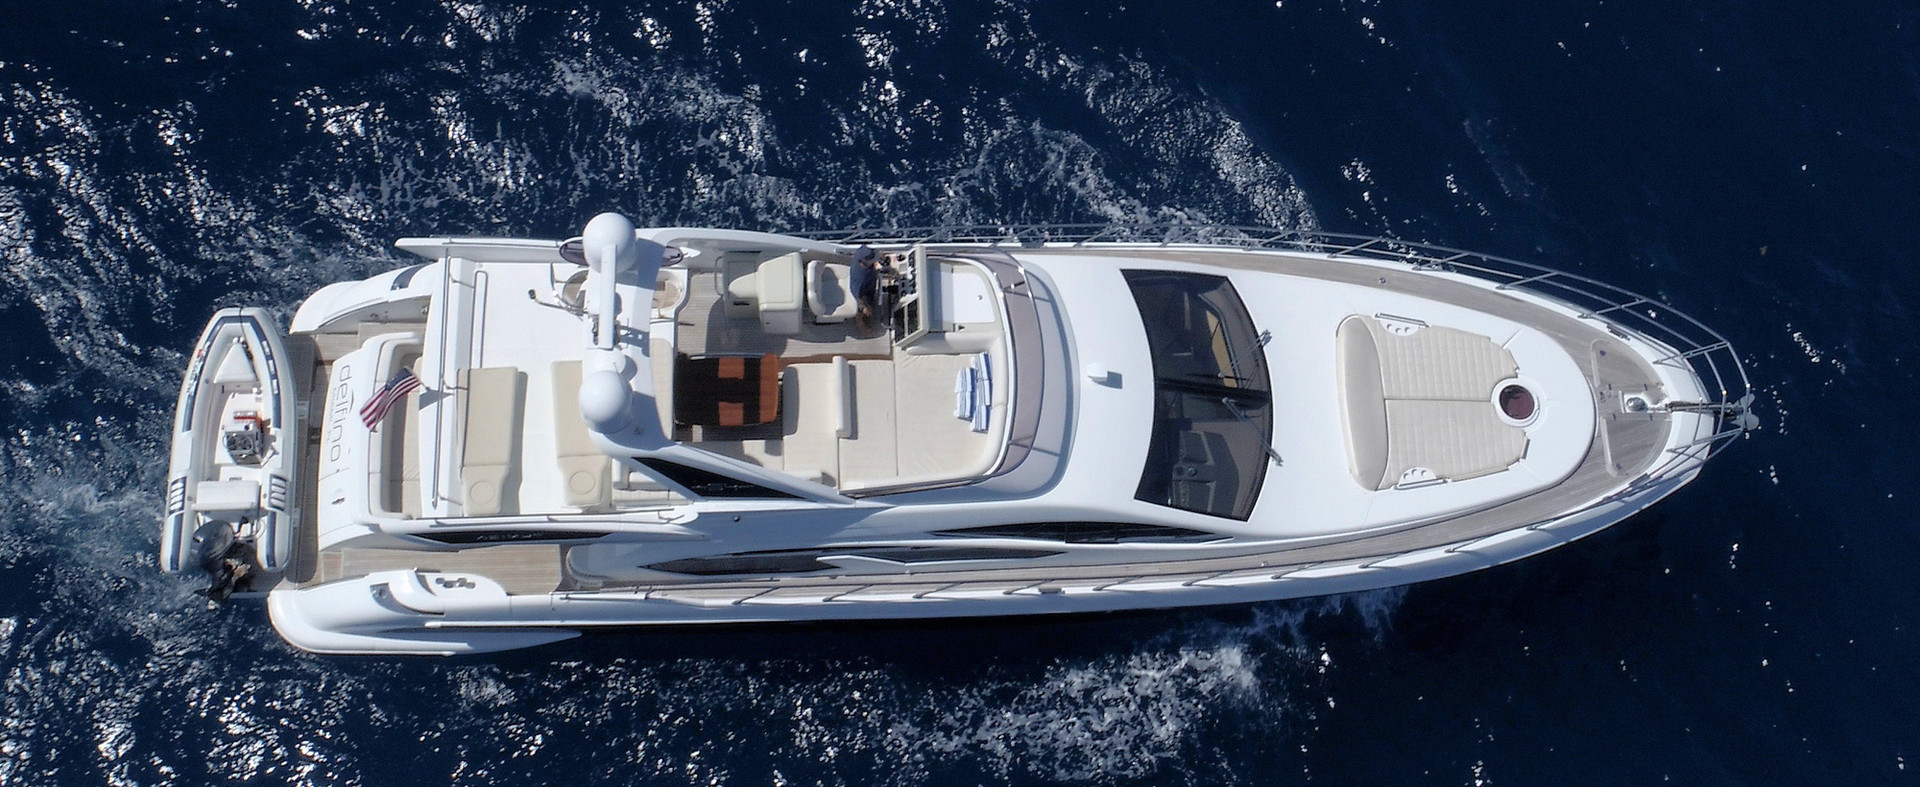 Yacht - Ryan Craft - 5-3-2017 (4 of 50)E